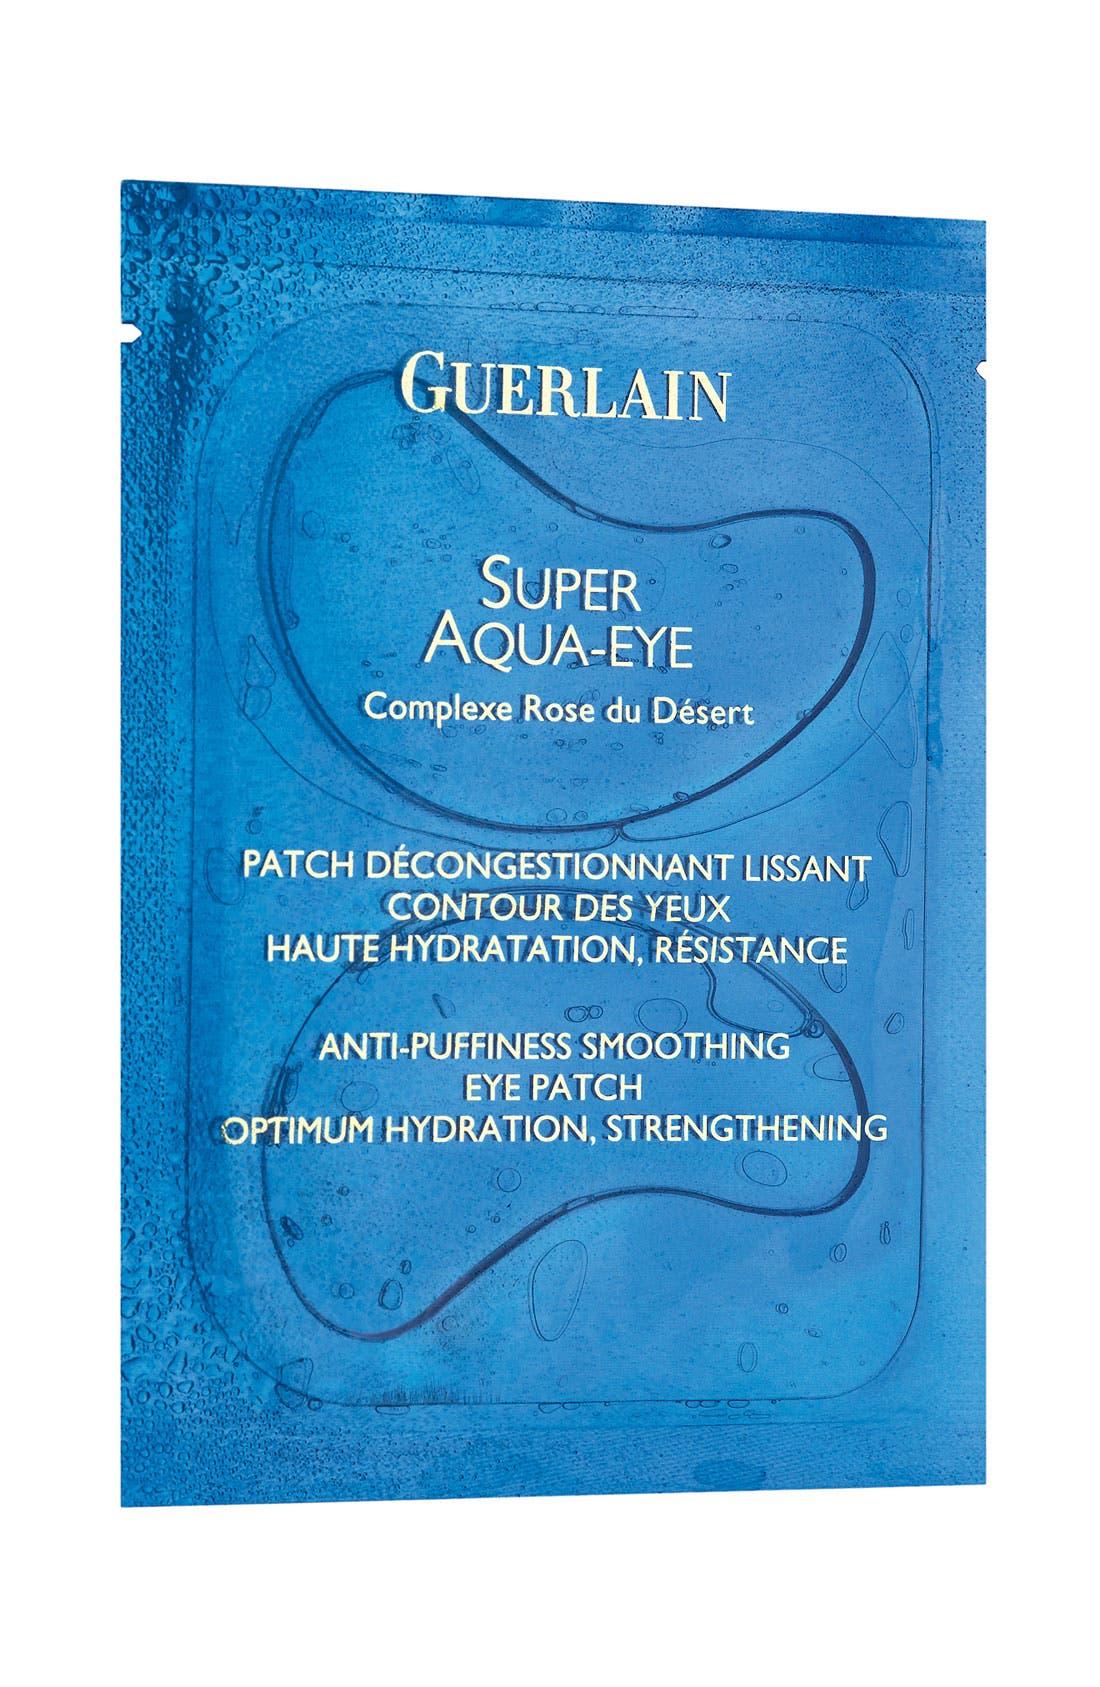 Guerlain 'Super Aqua-Eye' Anti-Puffiness Soothing Eye Patch